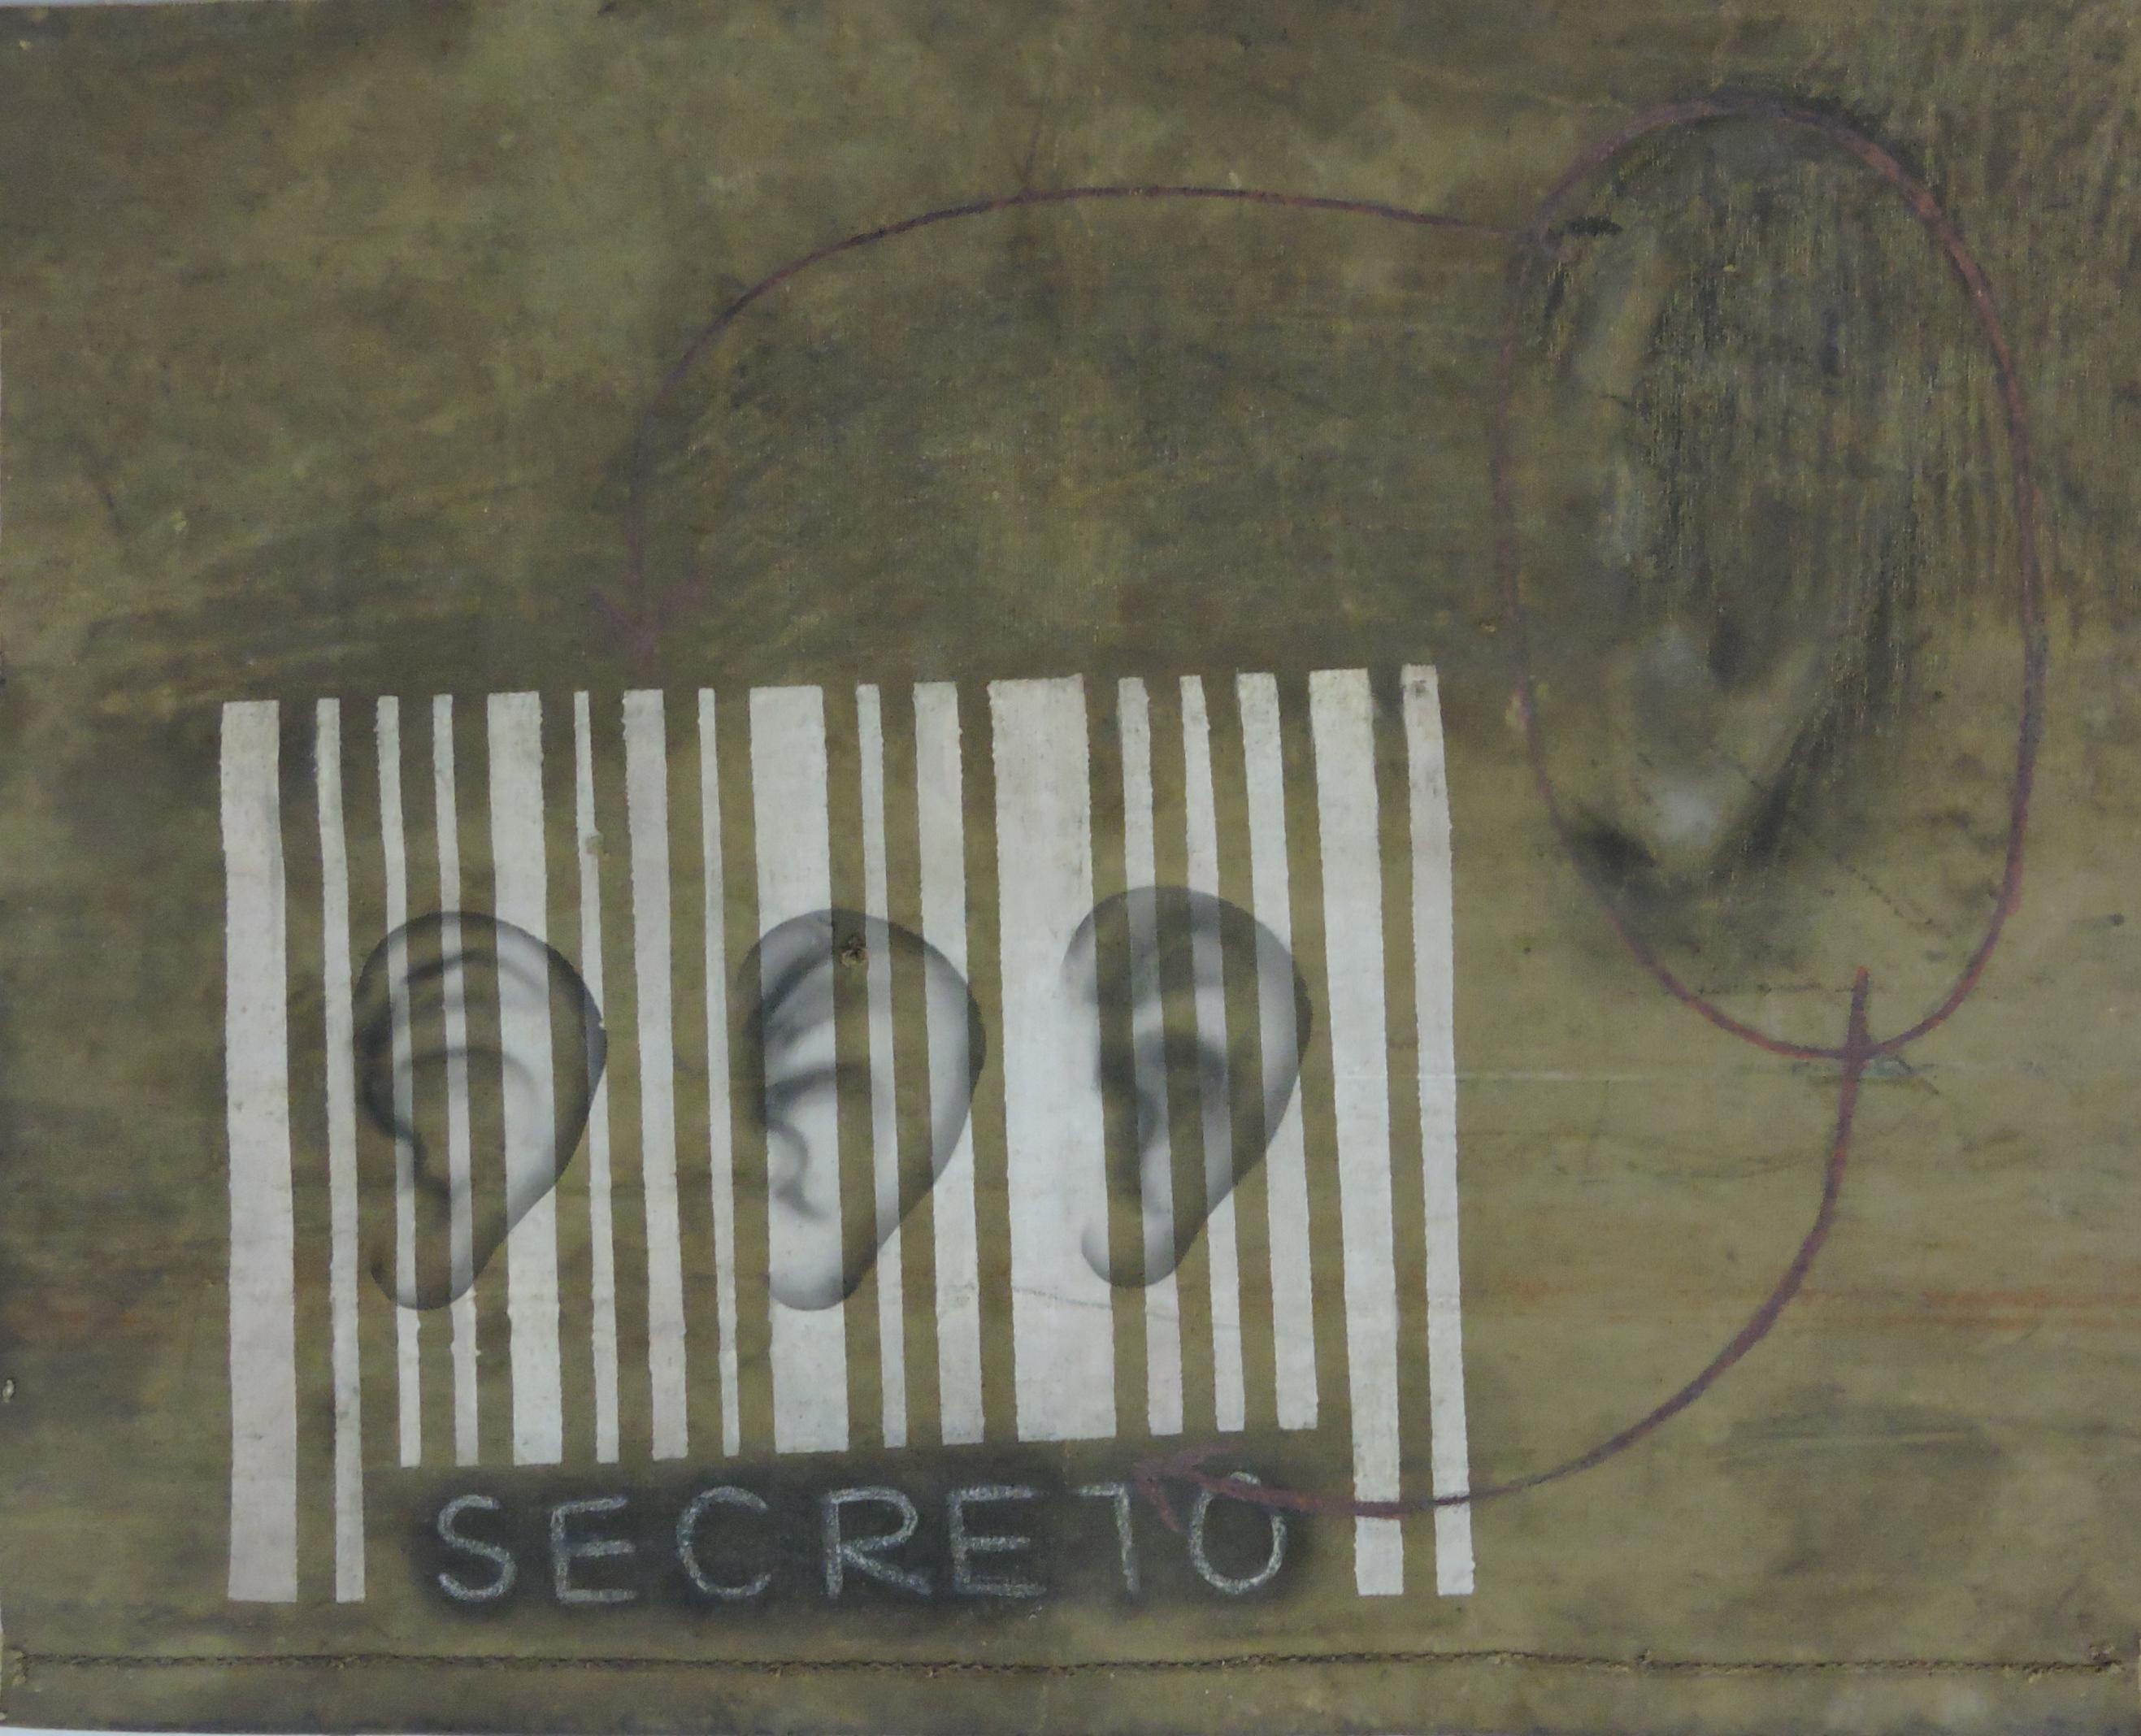 Genison_Oliveira_-_Exposição_Secreto,_Secreto,_2006._Mista_s_lona,_53.3_x_67.3